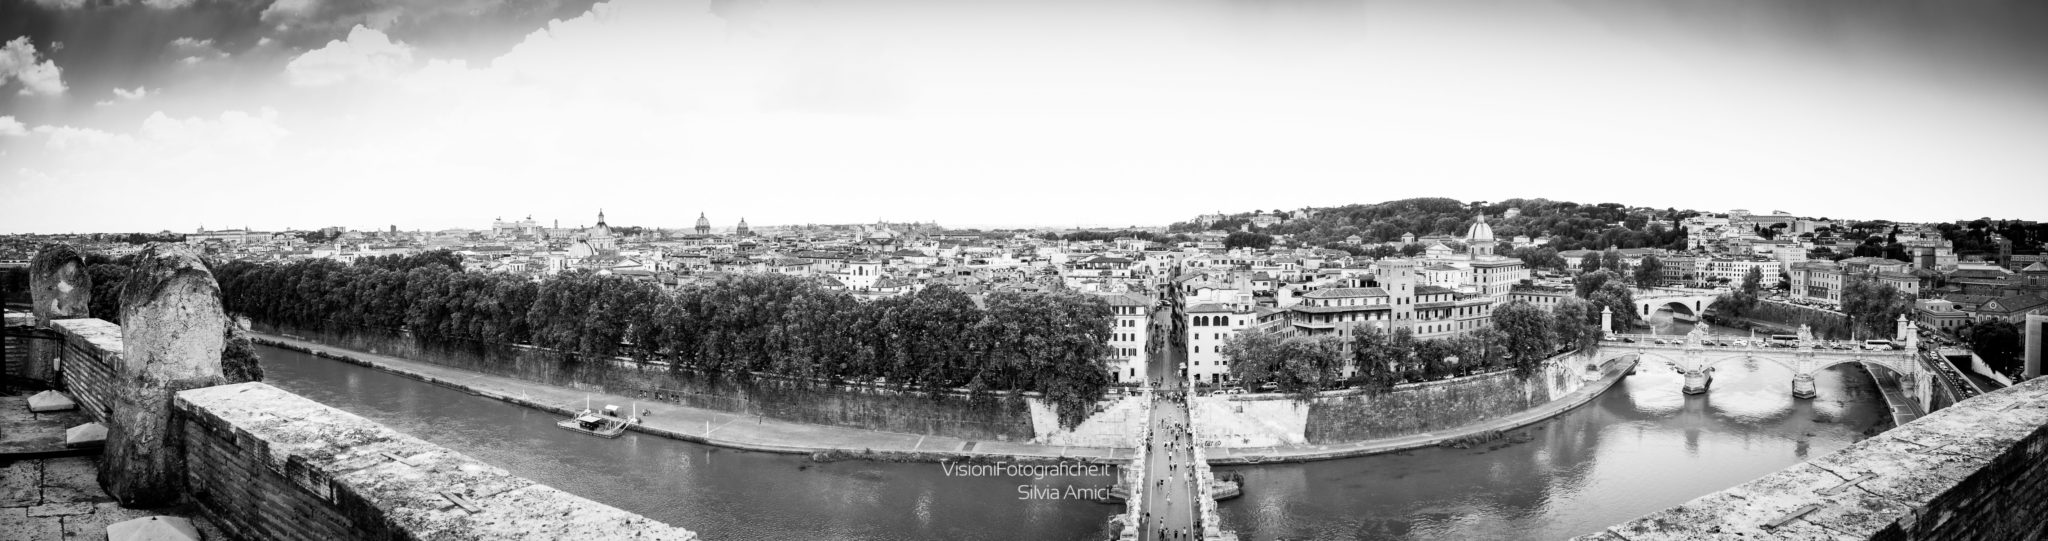 Panorama di Roma da Castel Sant'Angelo